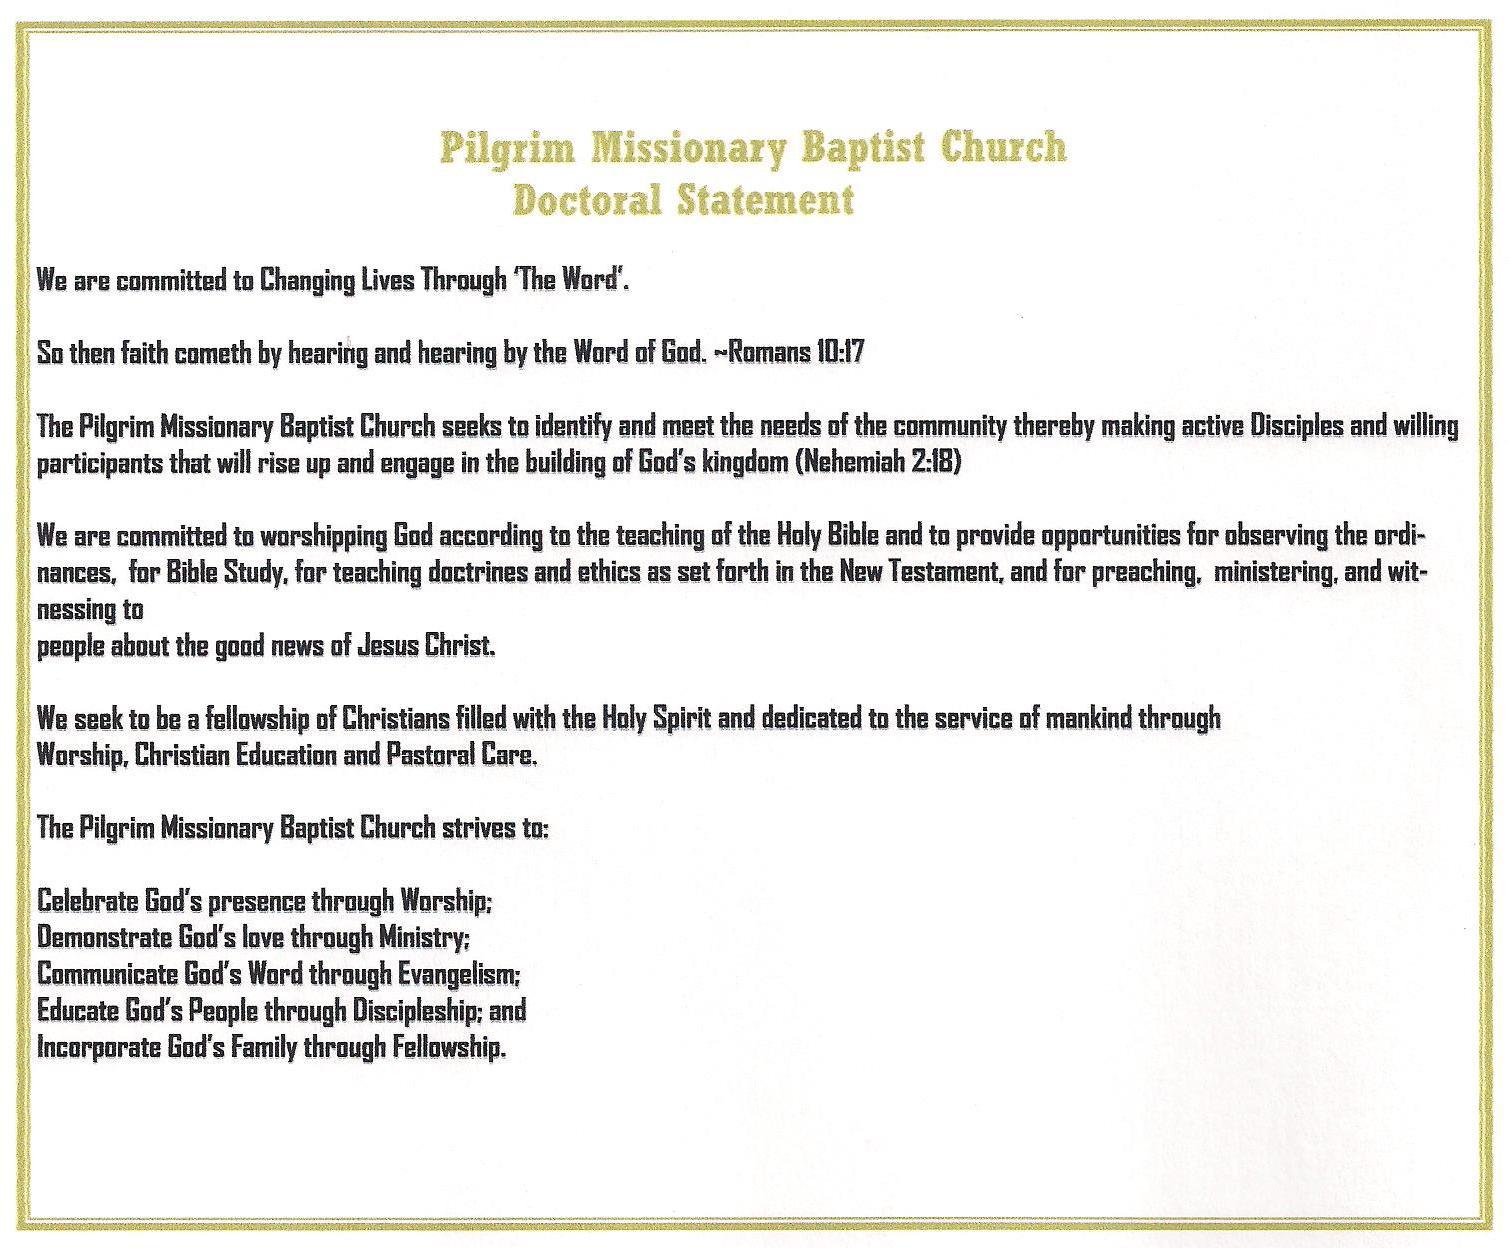 History | Pilgrim Missionary Baptist Church